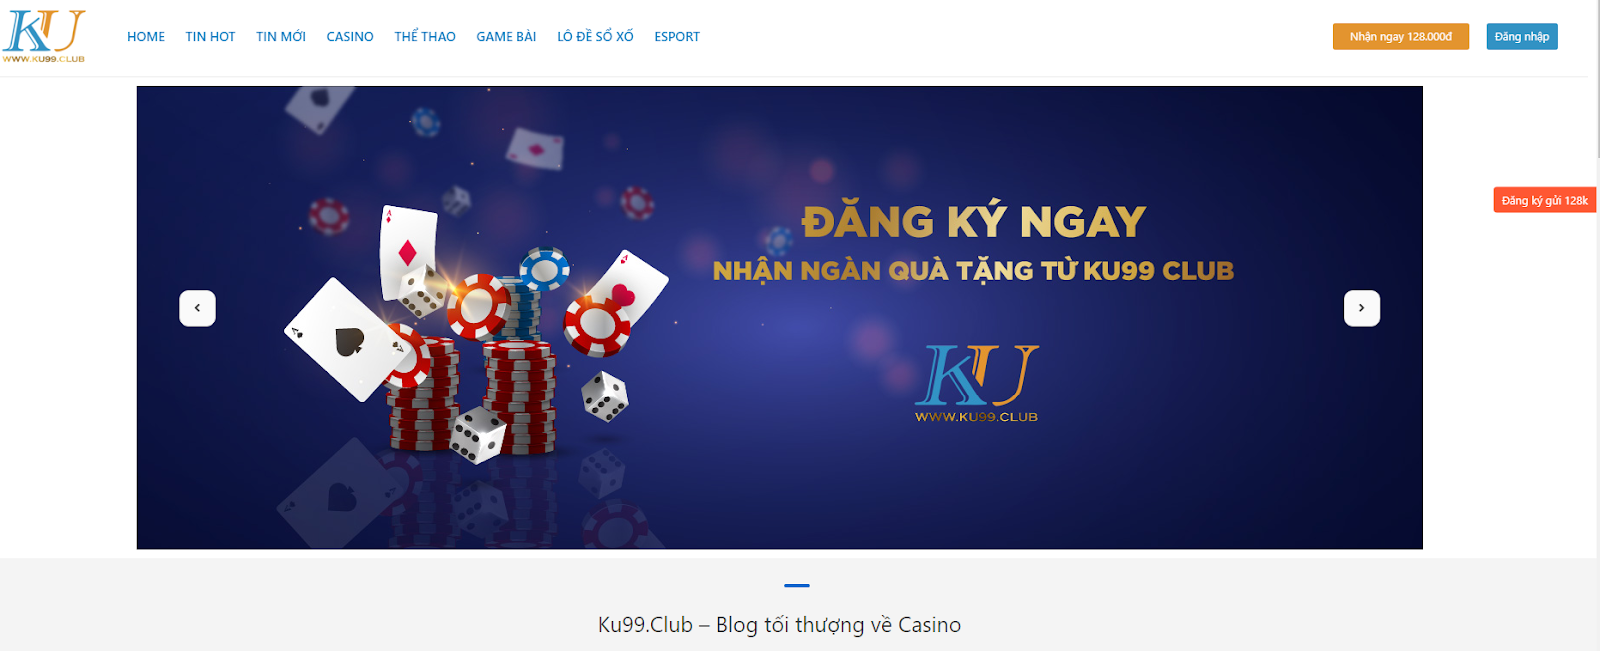 KU99-trang-web-ca-do-uy-tin-nhat-hien-nay-1